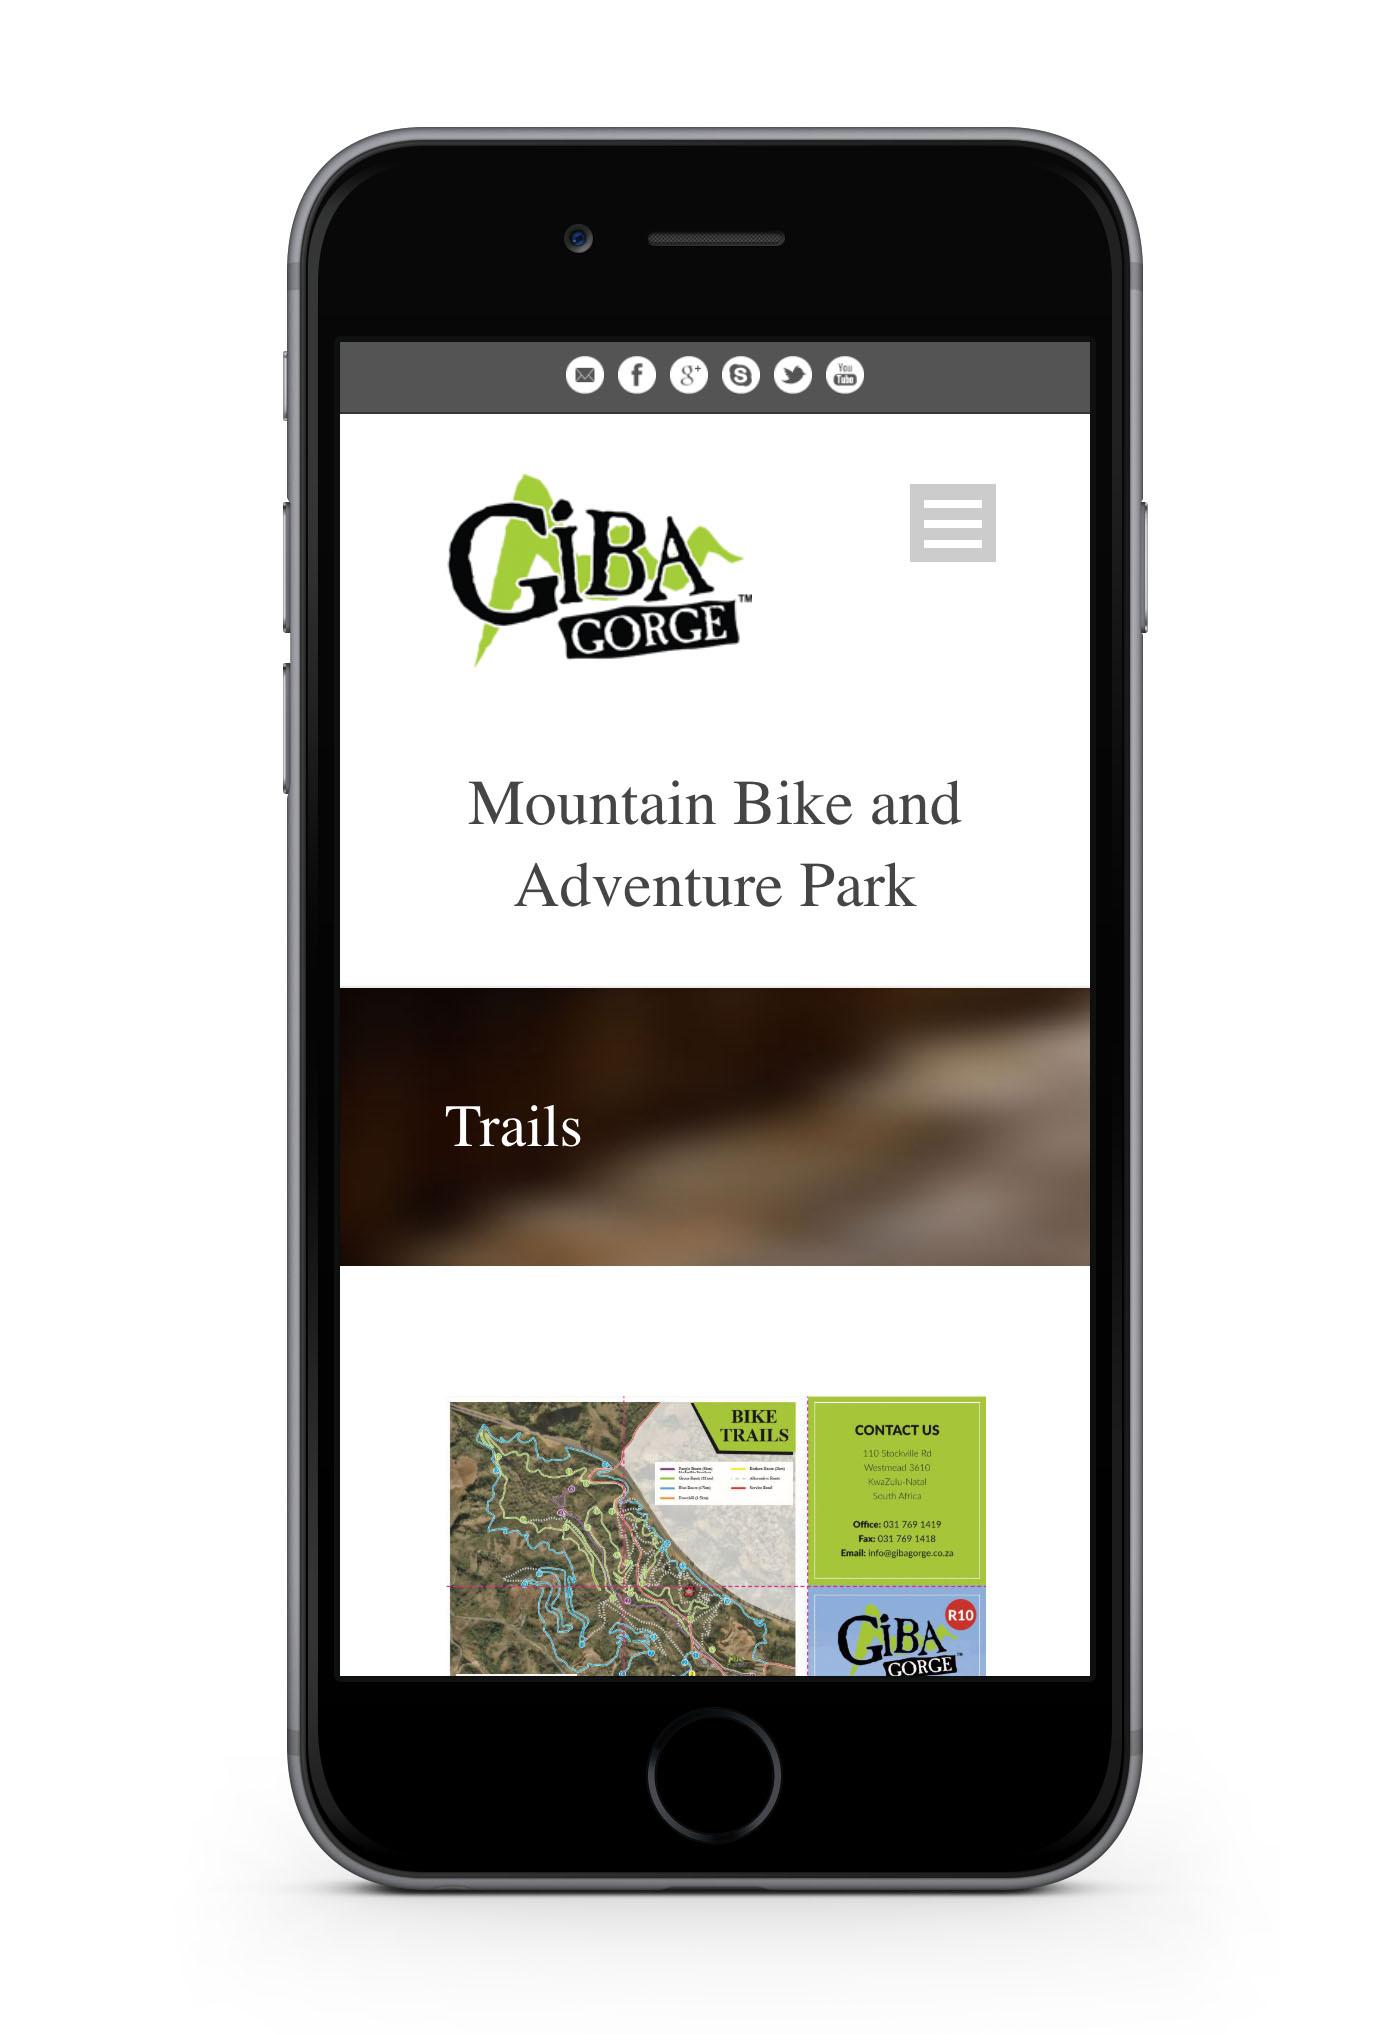 giba gorge web-design-portfolio-webdoor-responsive-web-design-agency-hillcrest-kwazulu-natal-phone